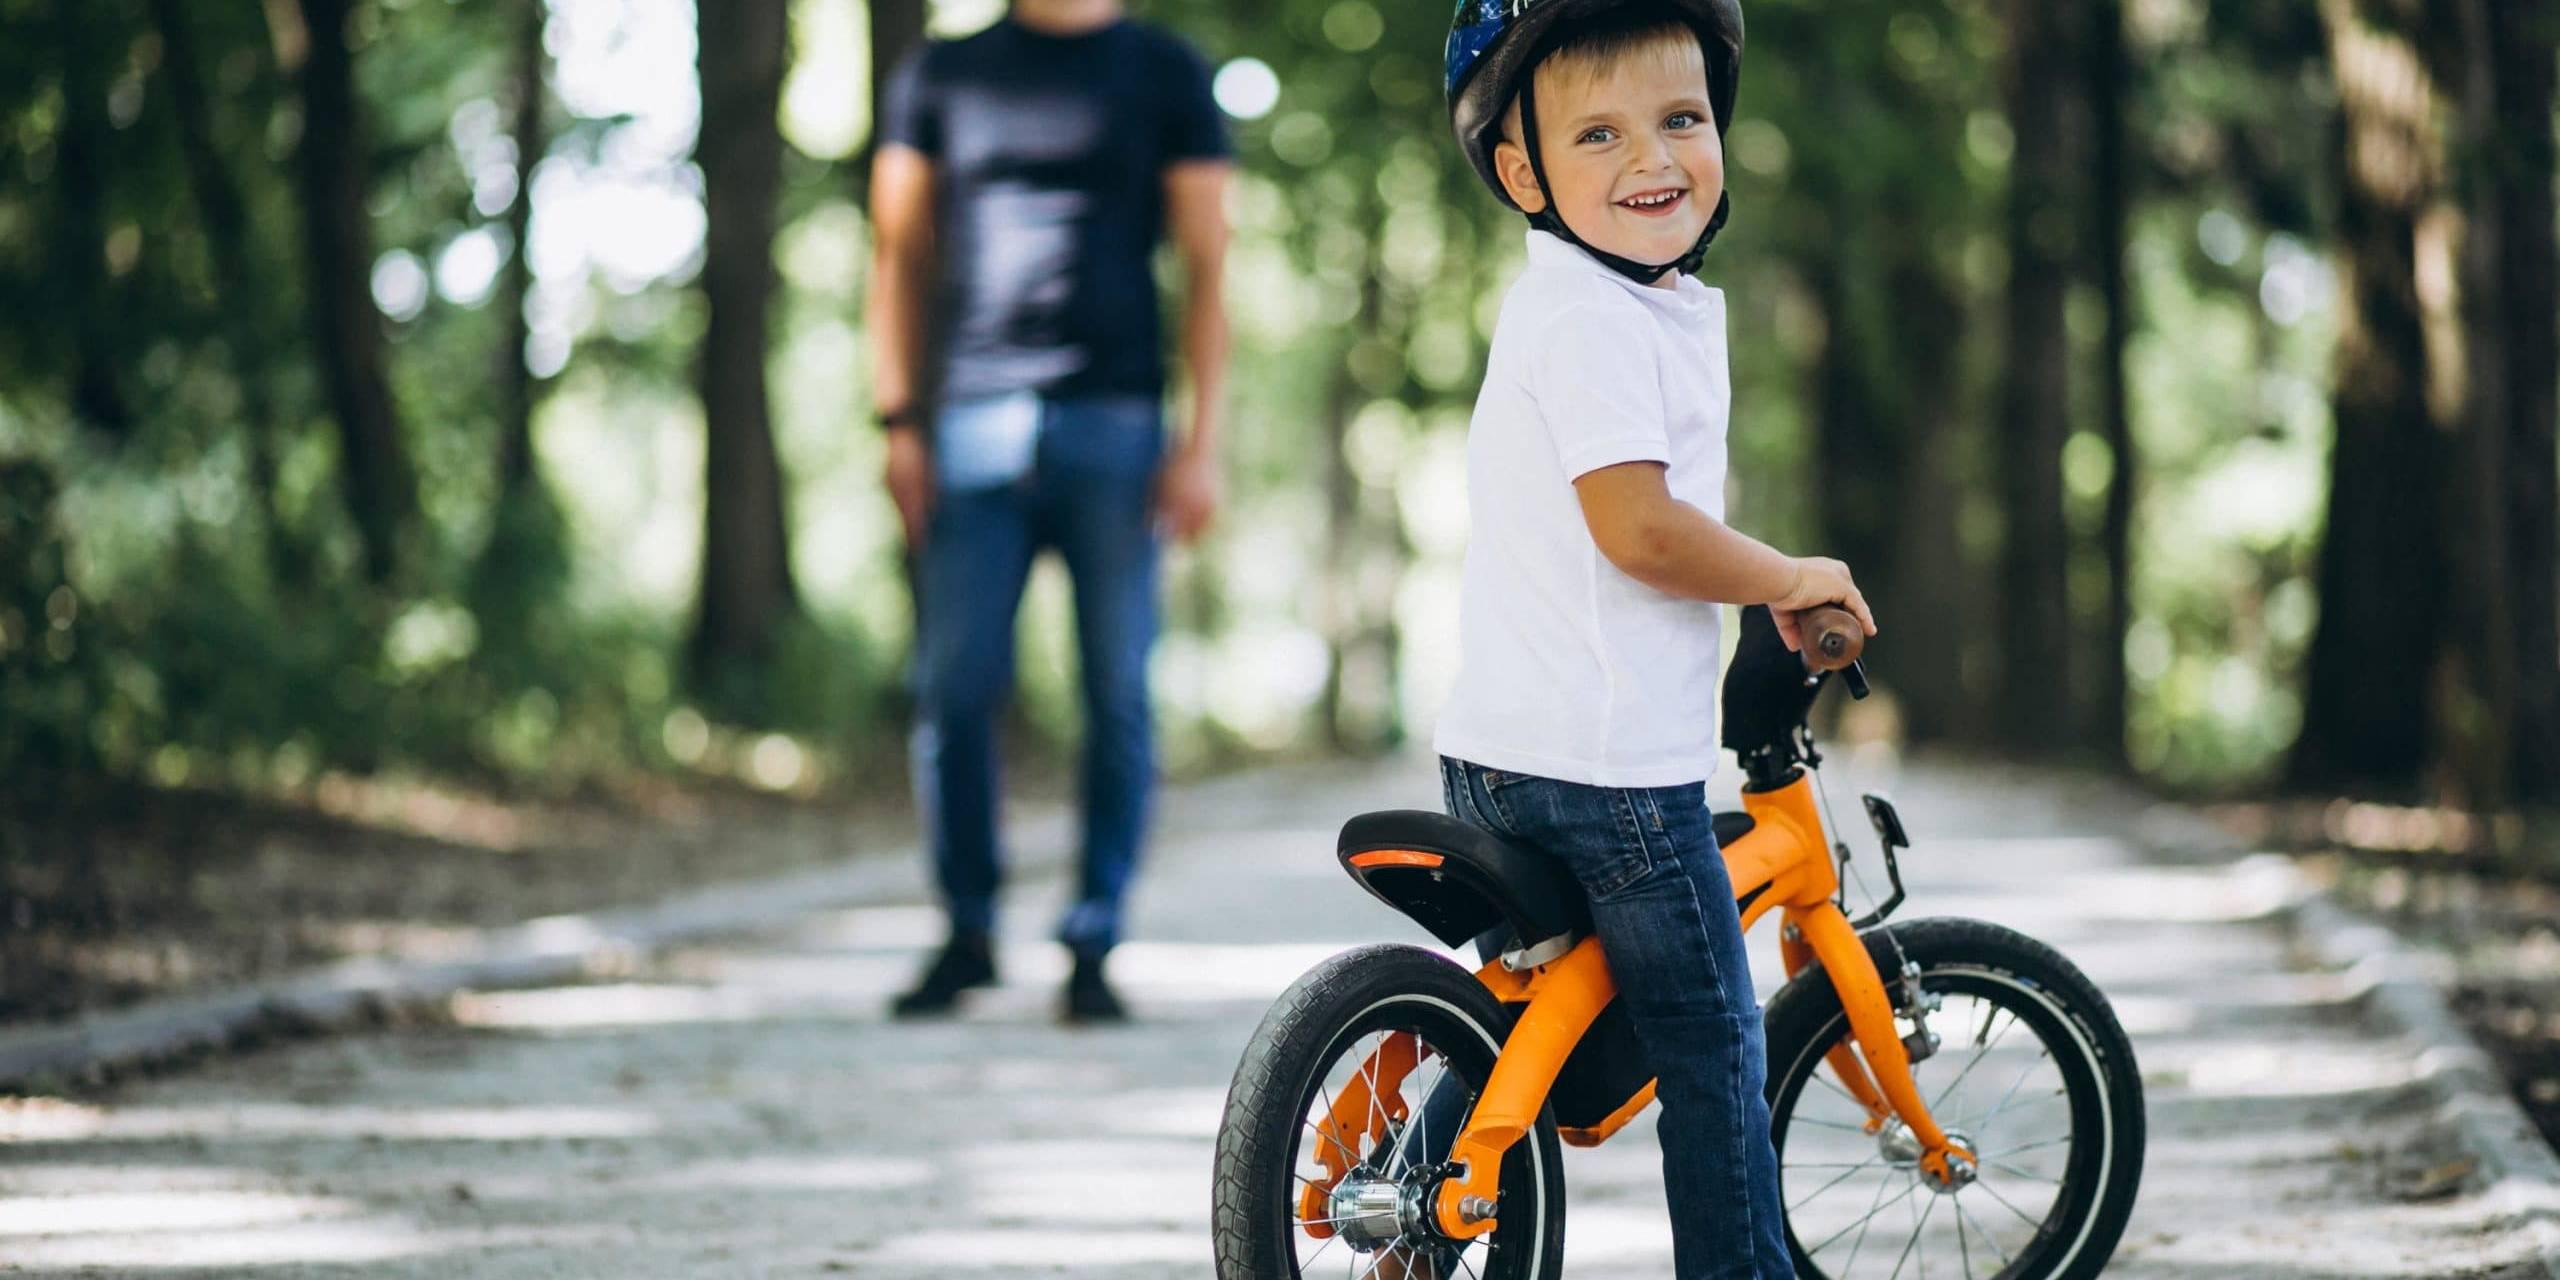 Transporter ses enfants en vélo